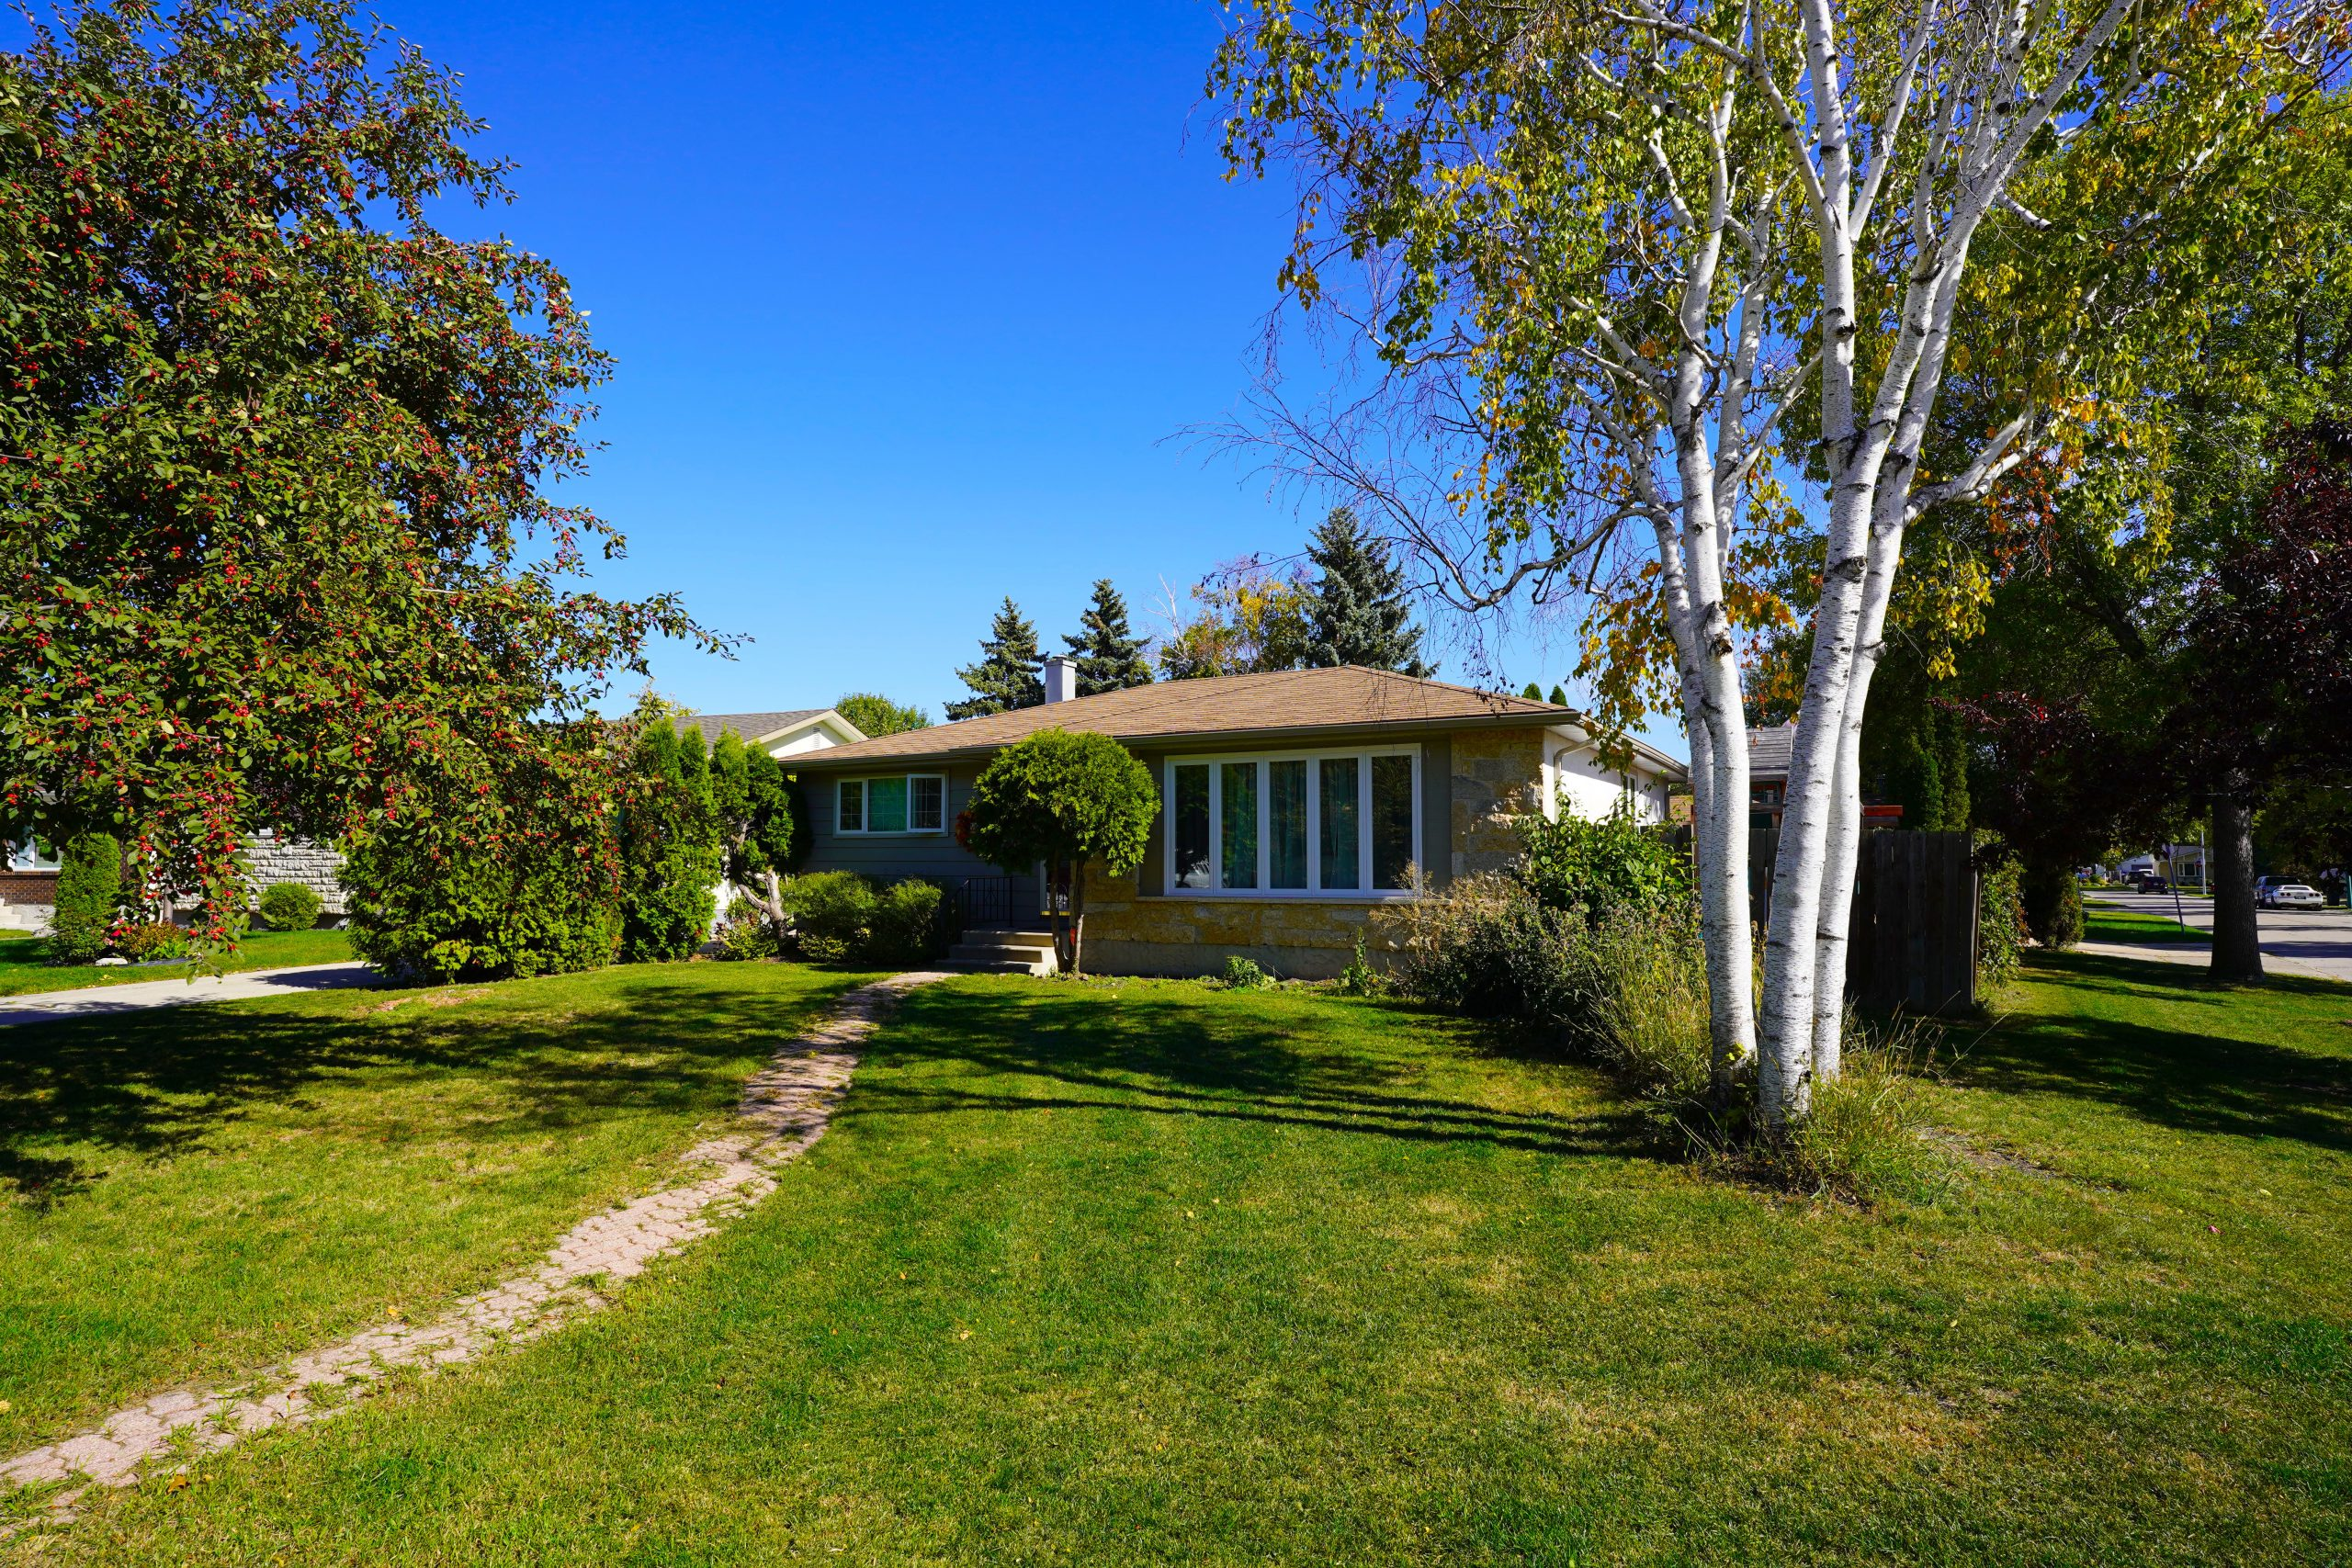 Valley Gardens House for Sale – 45 De Jong Crescent